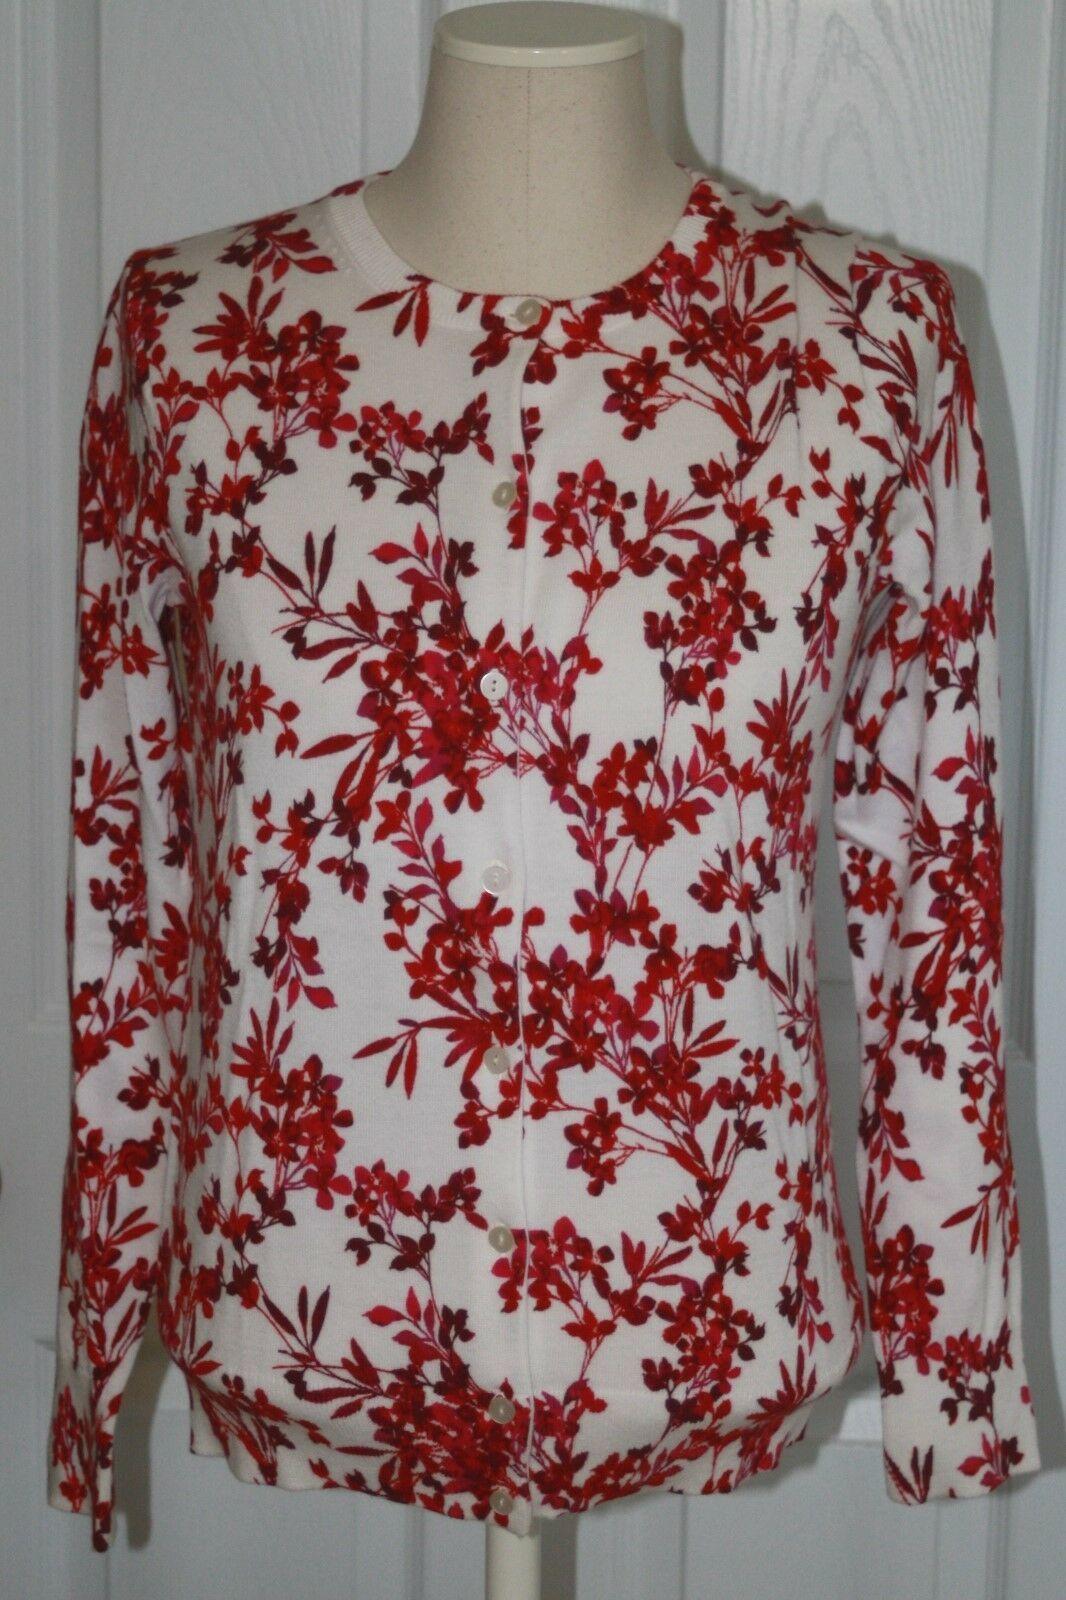 Lands End Women's Supima Print Cardigan Sweater Brandywine Floral New - $29.99